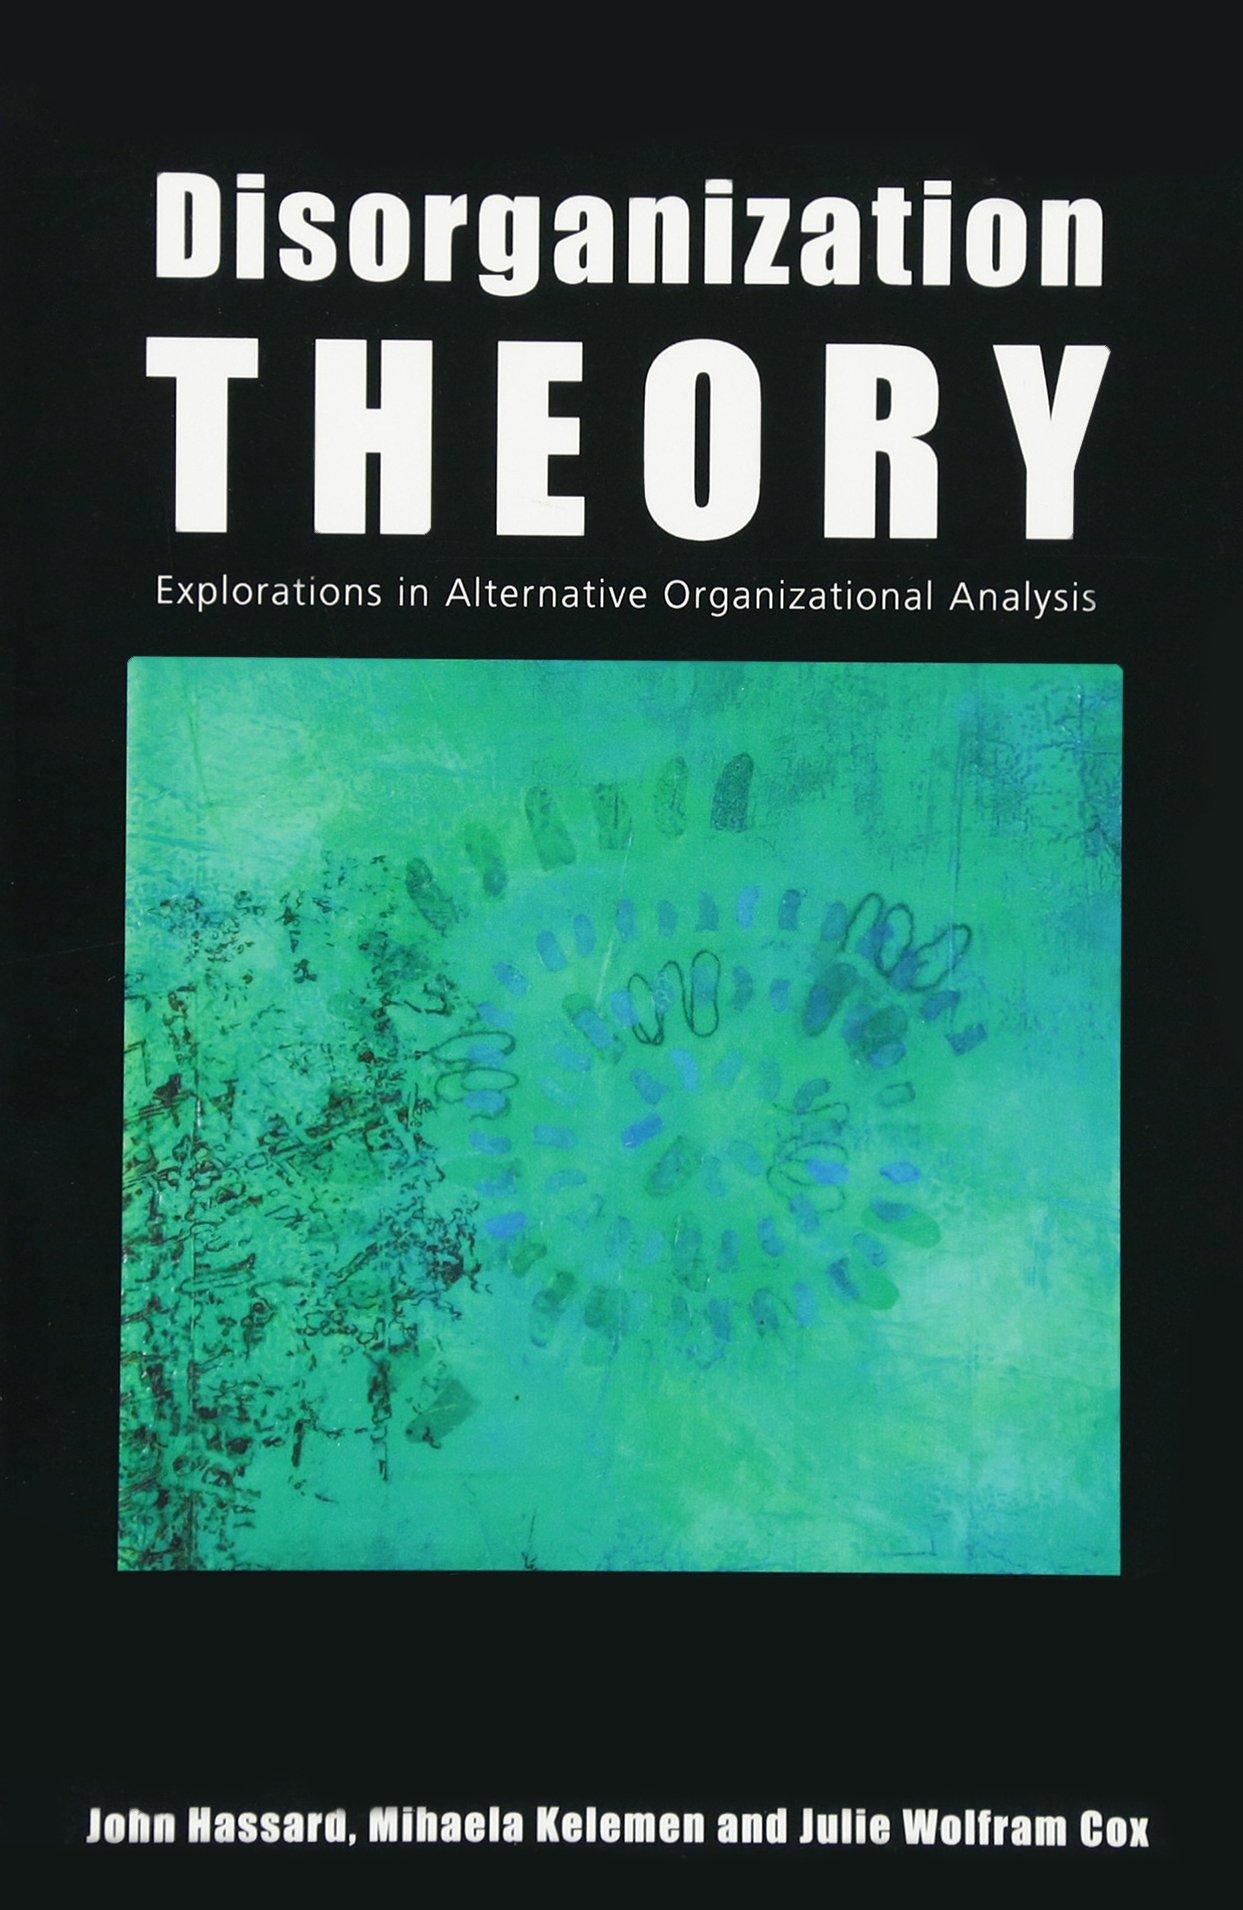 Disorganization Theory: Explorations in Alternative Organizational Analysis